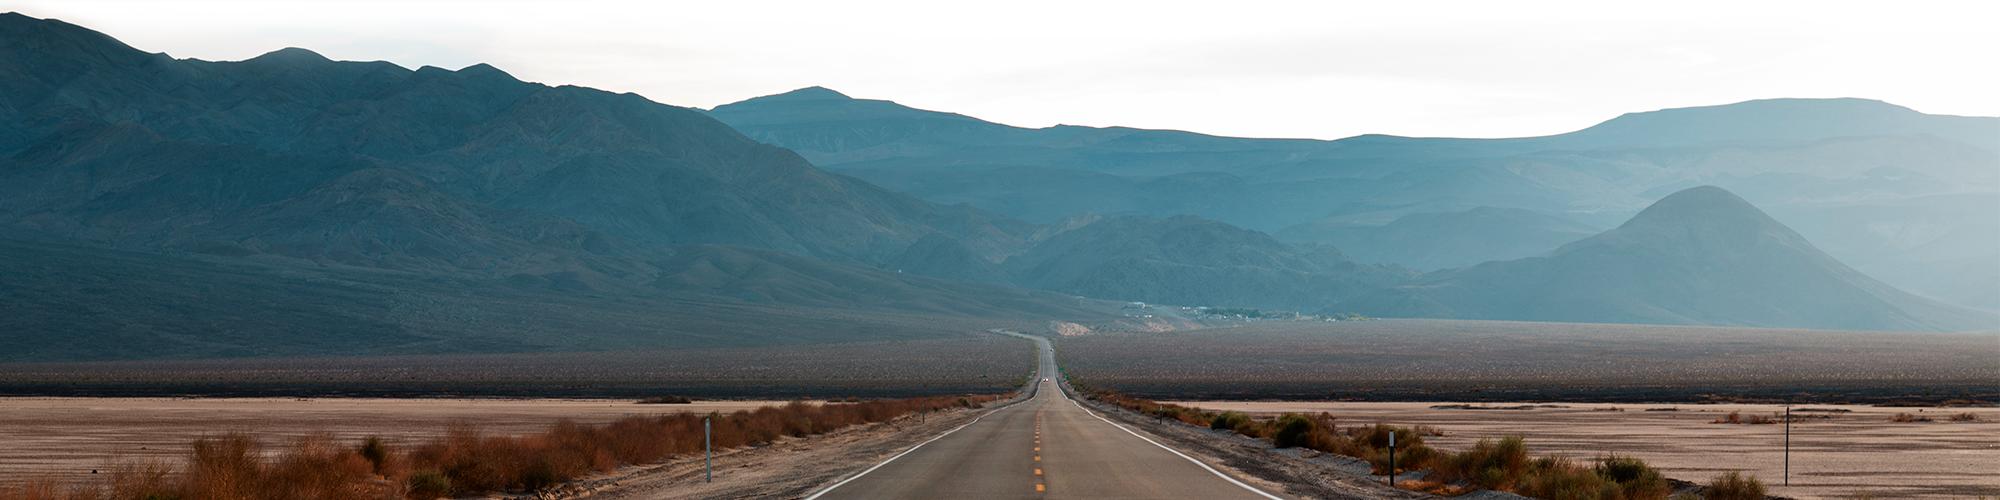 Background image of empty highway